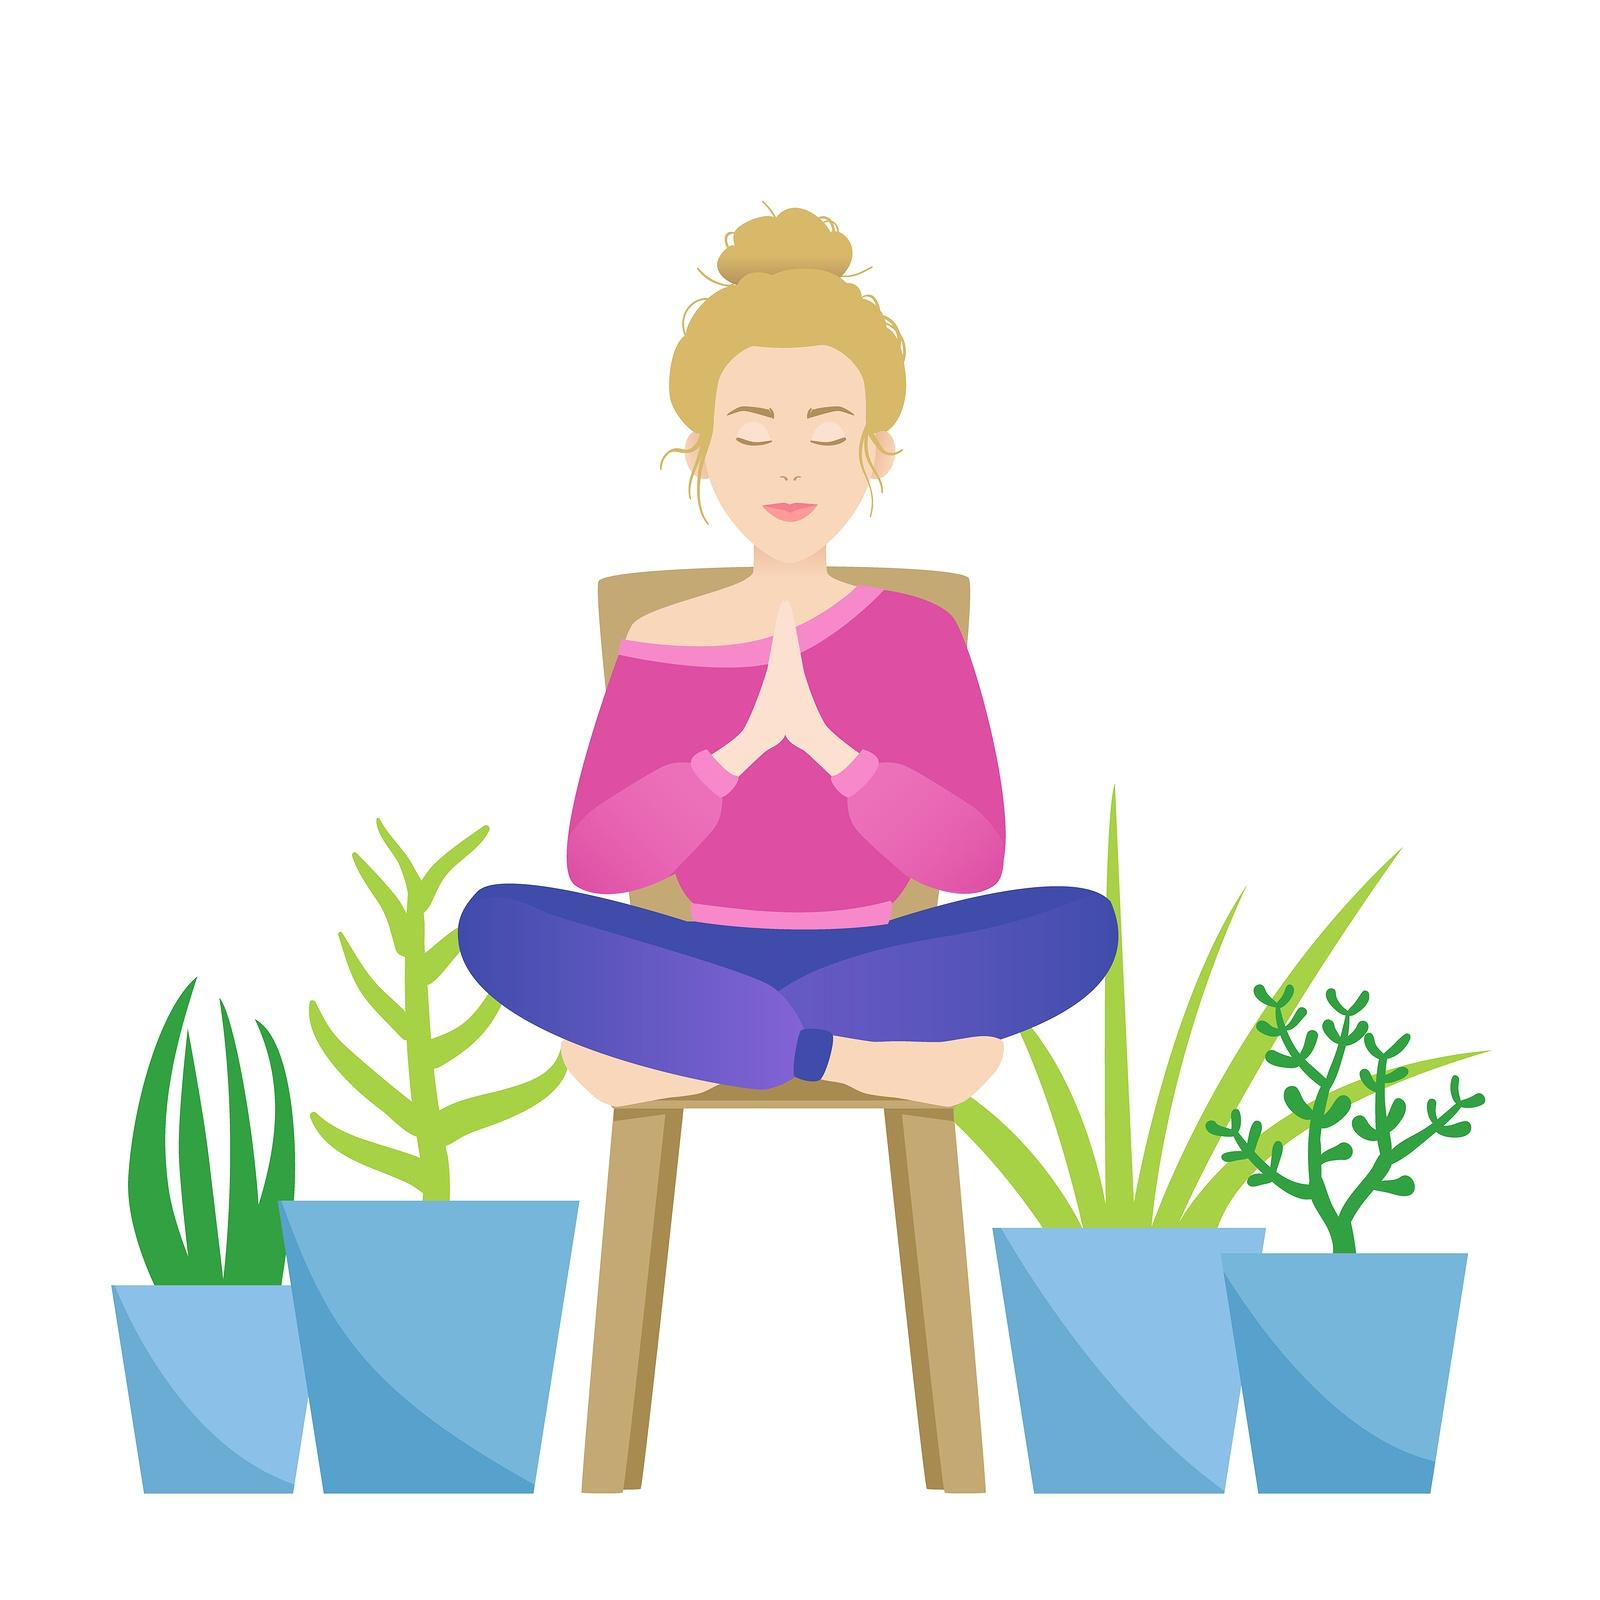 Getting Uncomfortable (Chair Yoga)